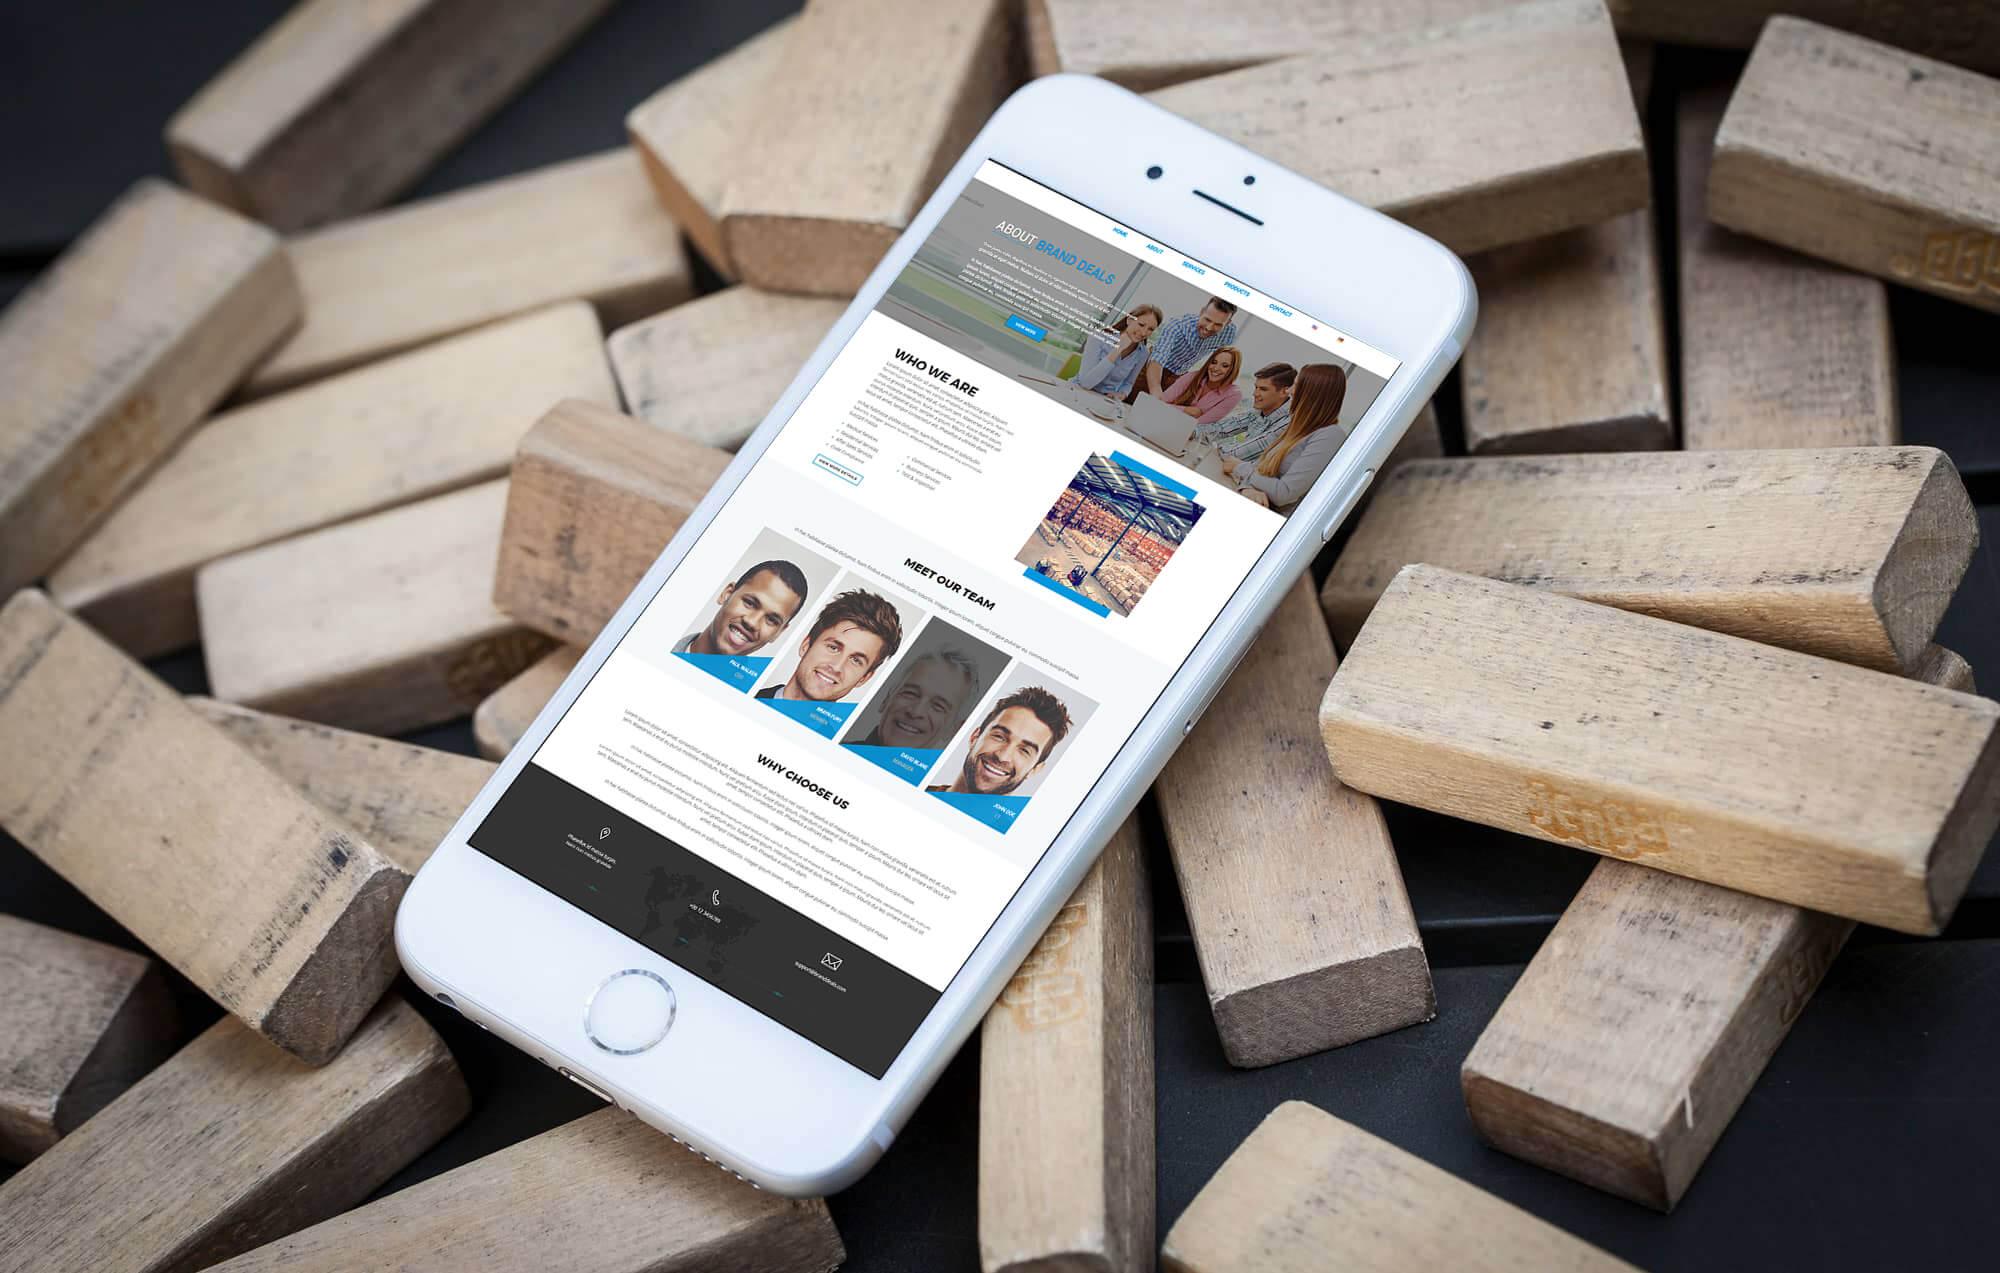 Brandcrock-BrandDeals-BrandCrock-portfolio-our team-iphone